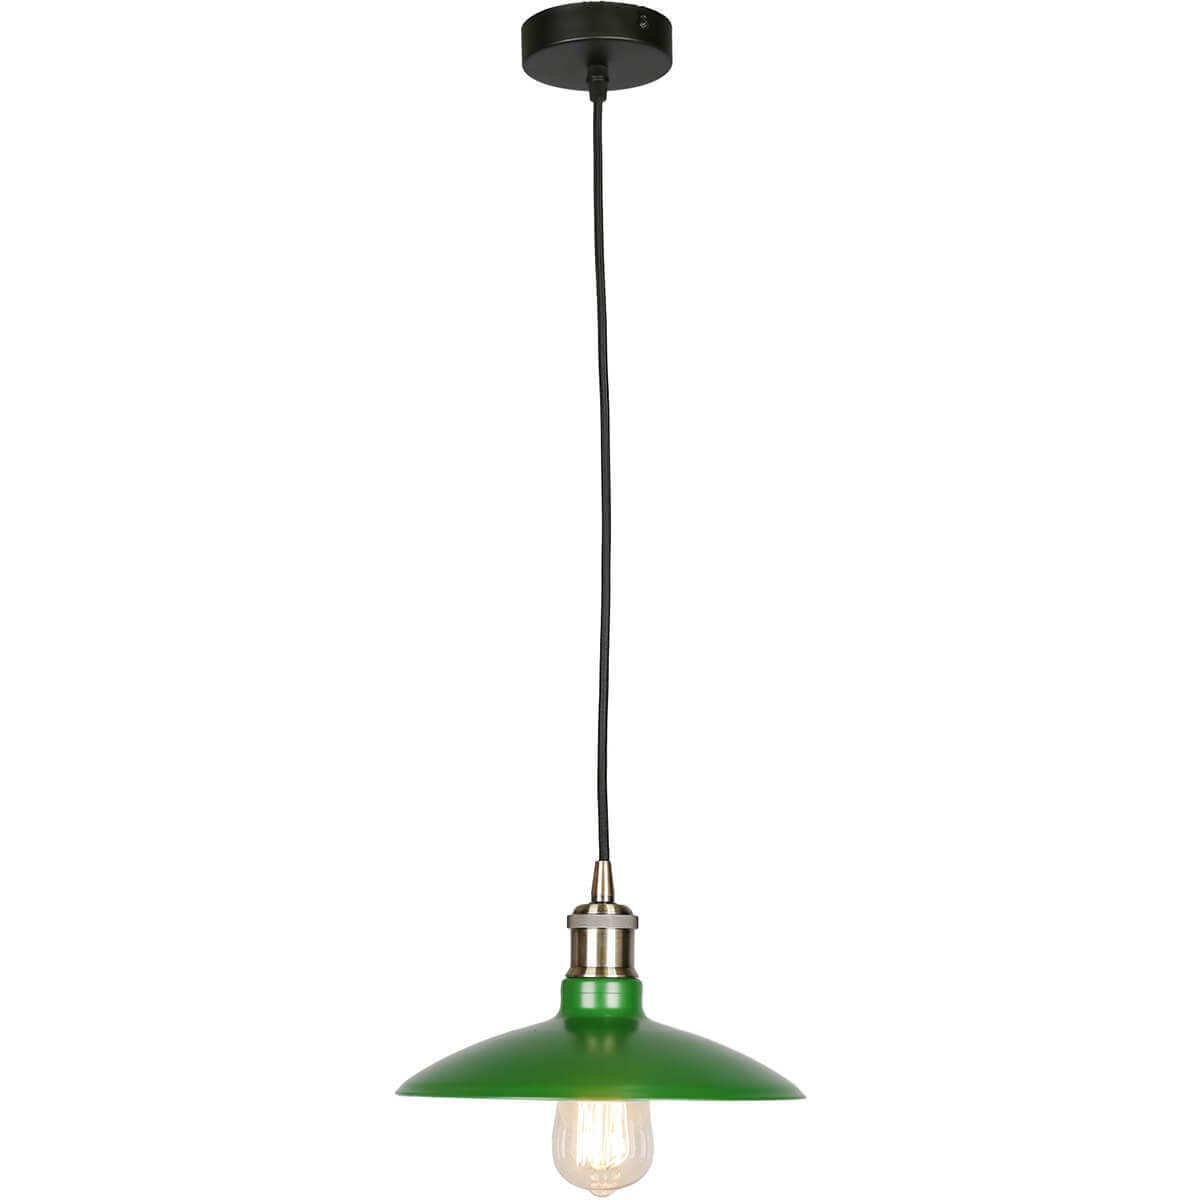 Подвесной светильник Omnilux OML-90826-01, E27, 60 Вт